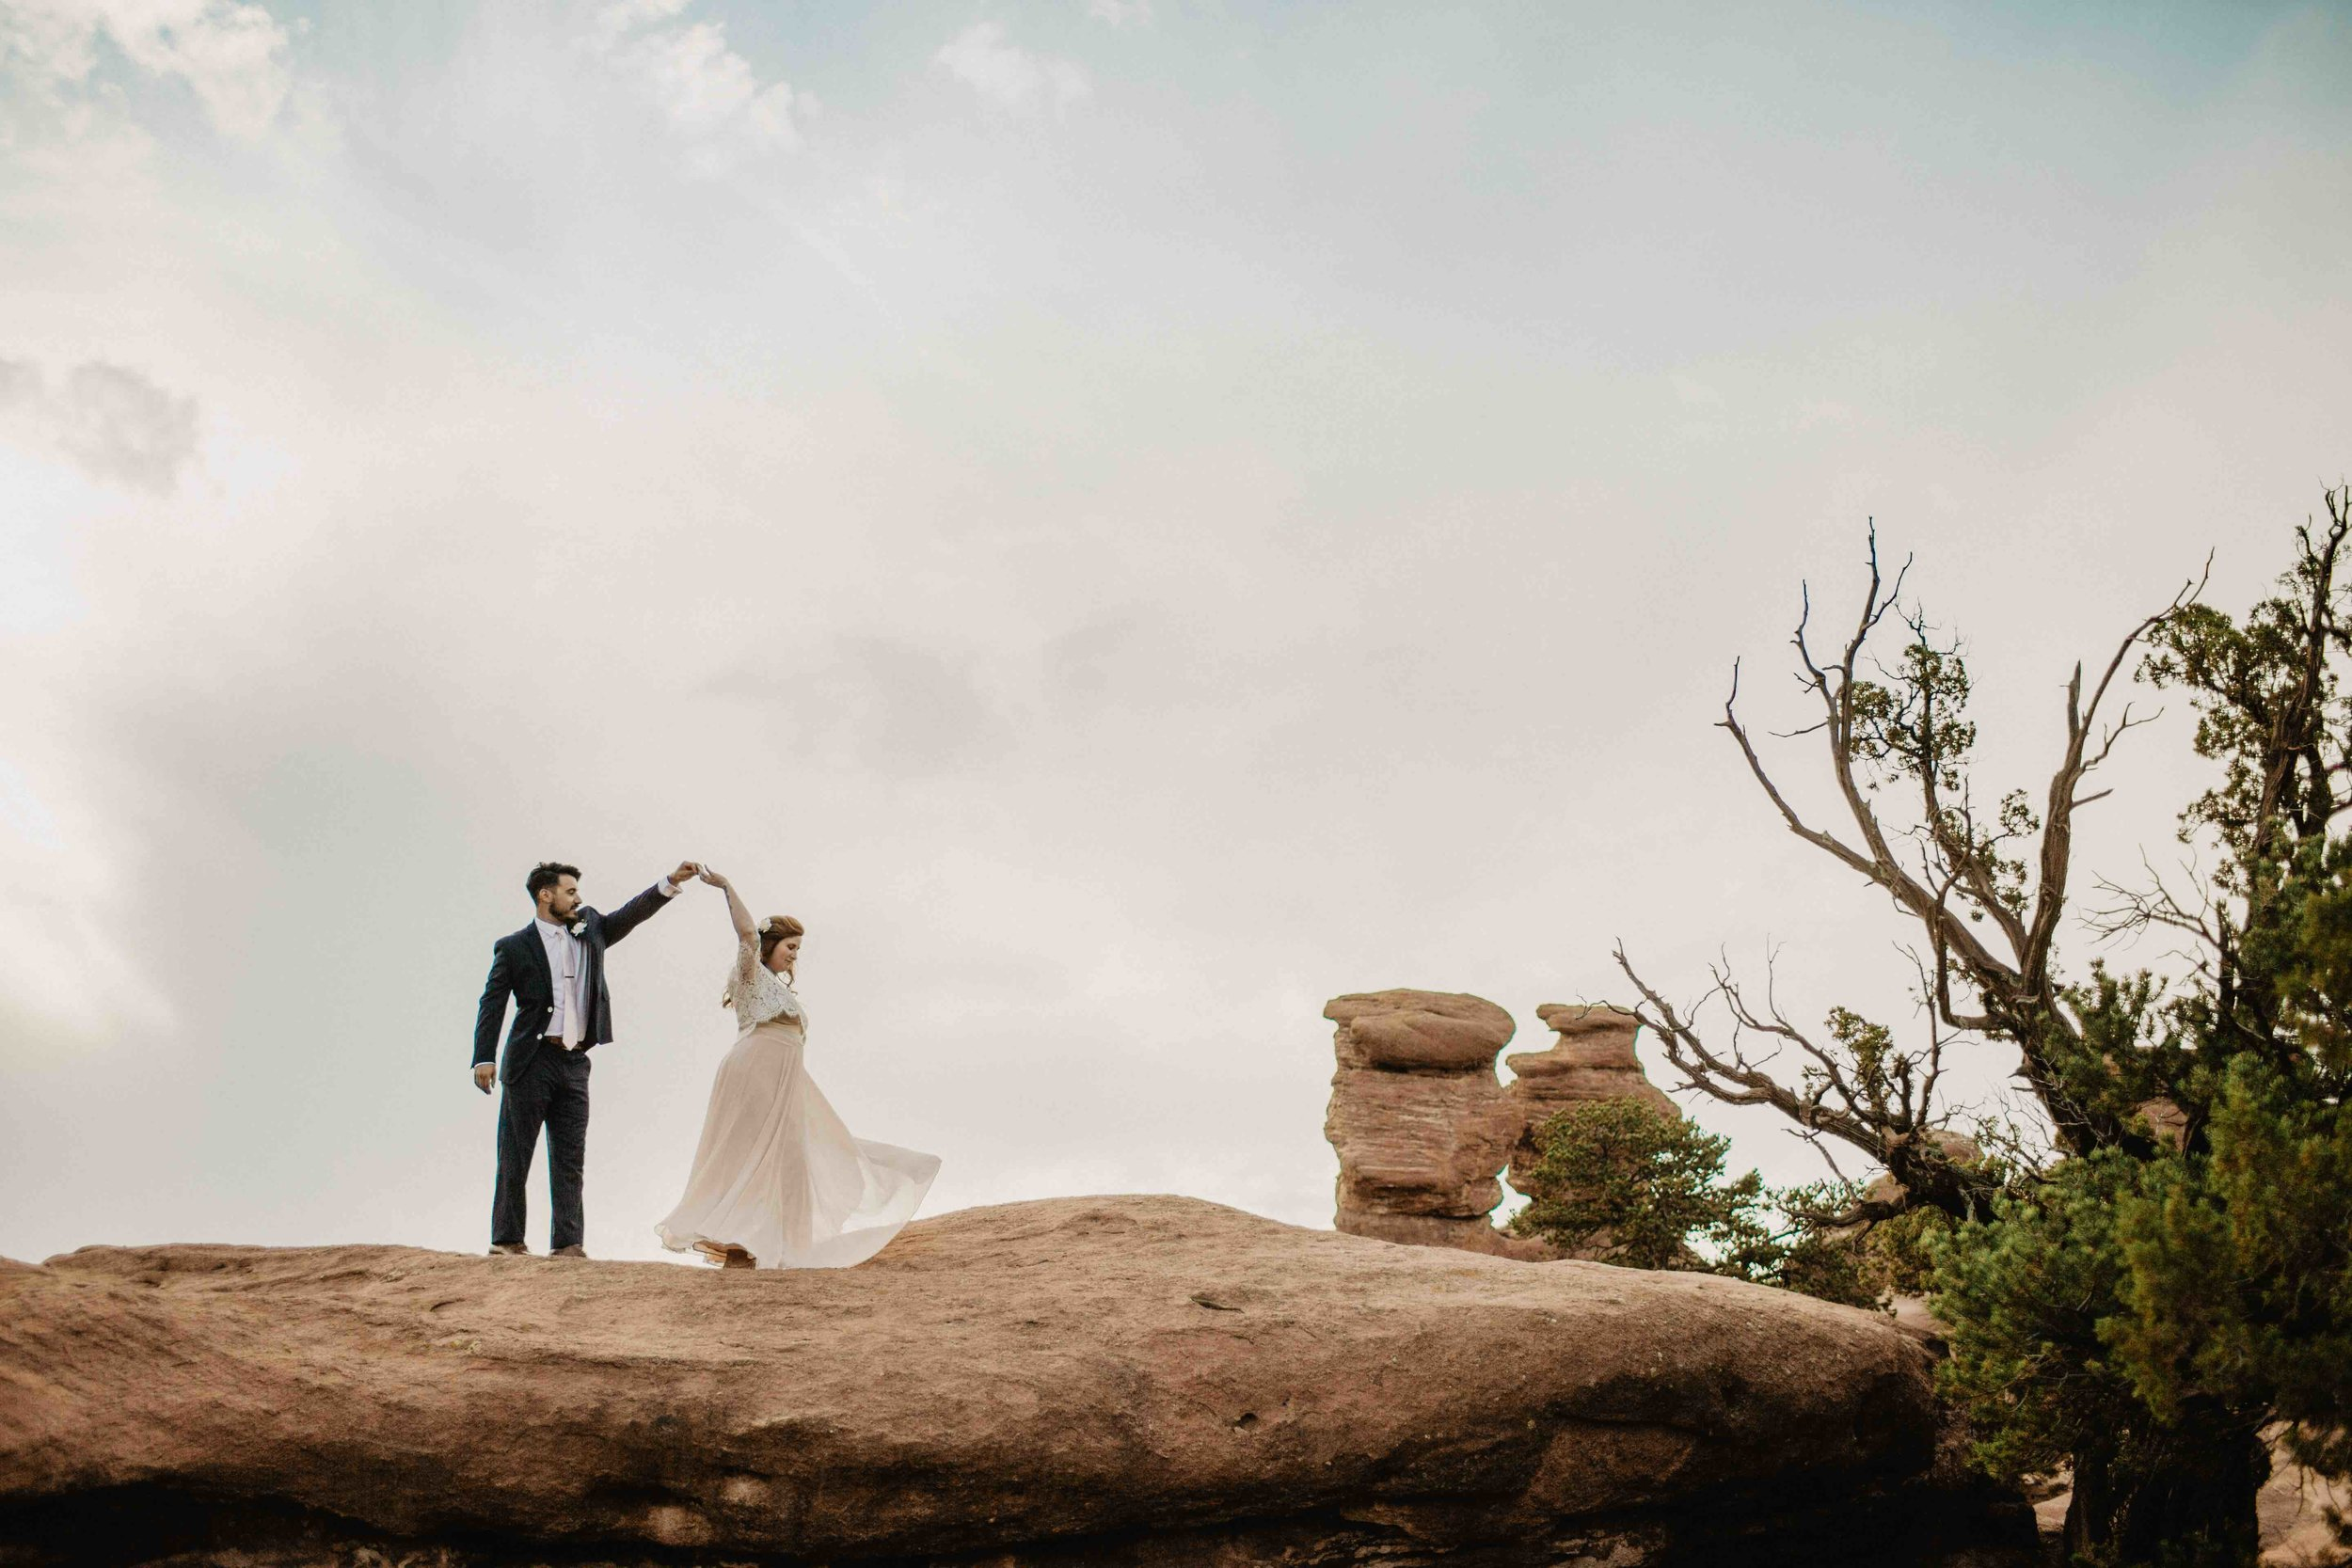 -colorado-wedding-photographer-denver-springs-vail-607A4111.jpeg